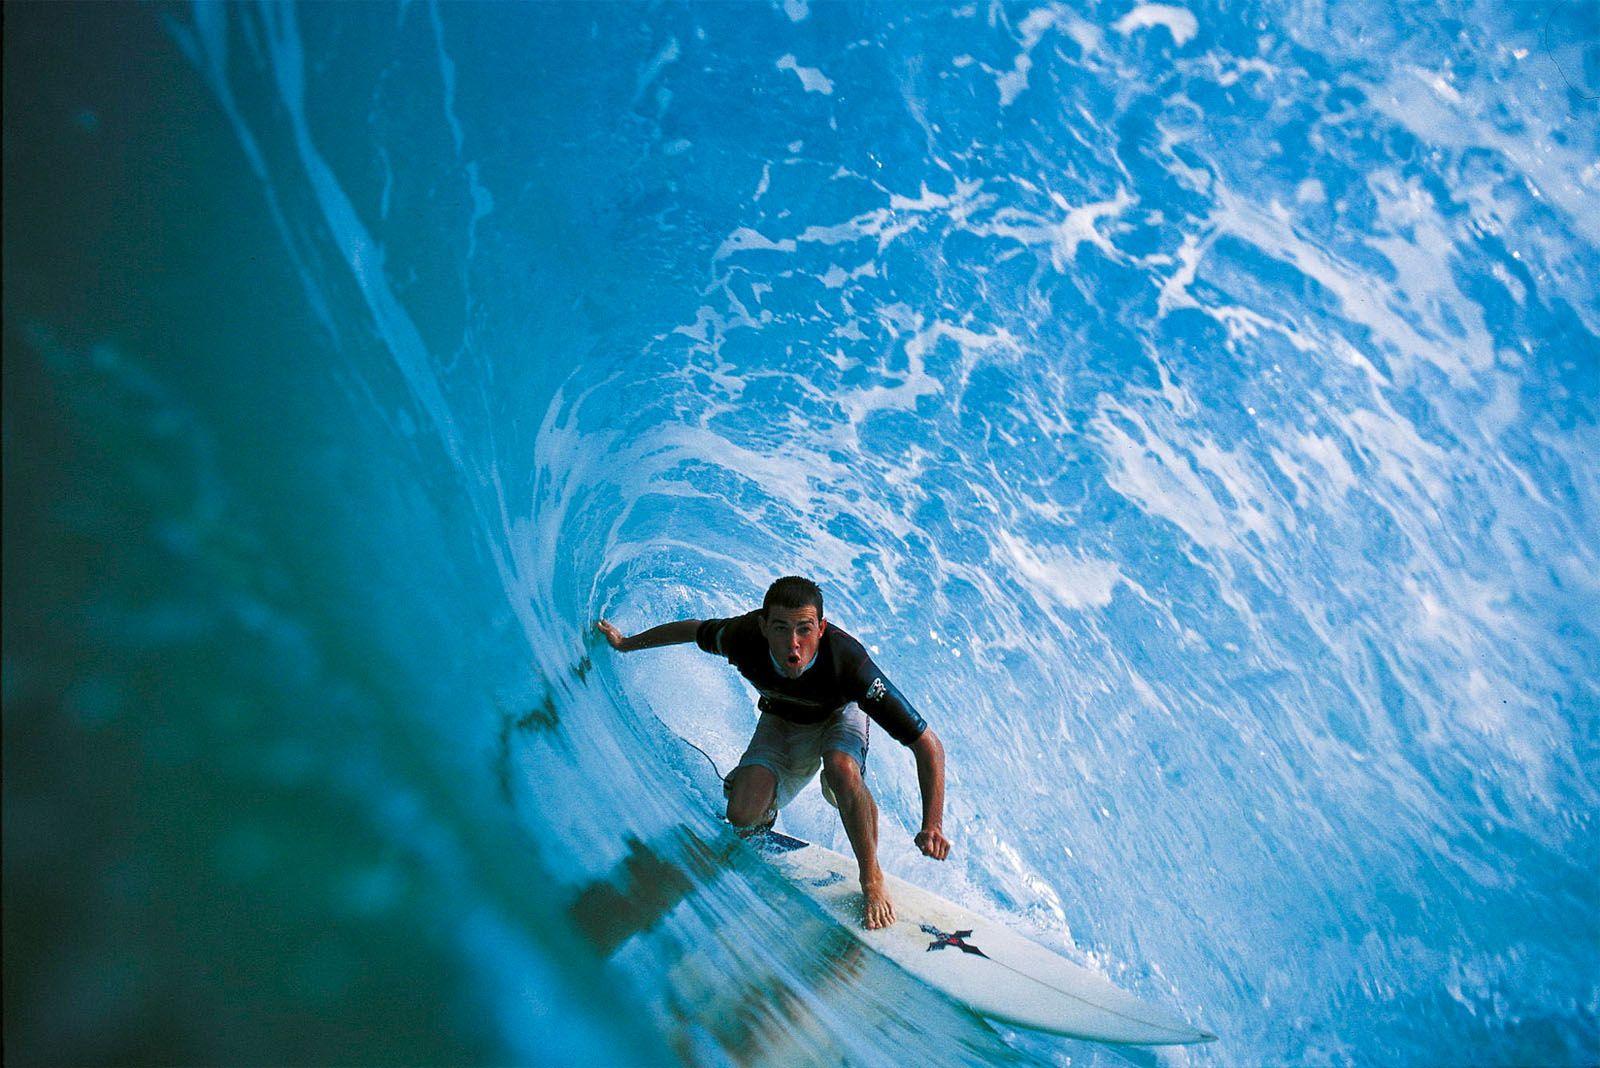 Blue Cave Ian Battrick Deep In The Barrel In Hossegor France Photo Remove156 Photos De Surf Hossegor Surfeur